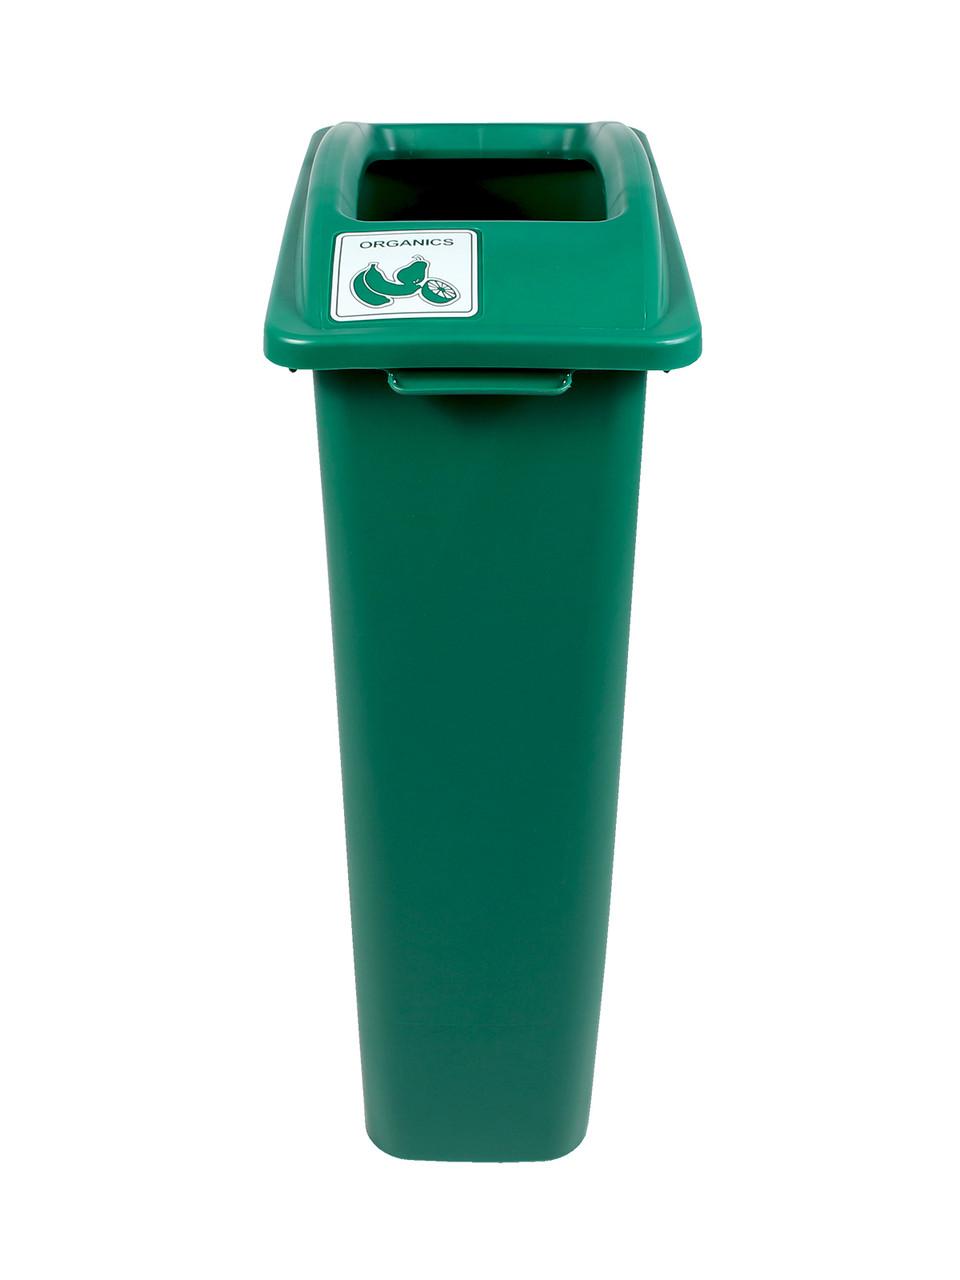 23 Gallon Green Skinny Simple Sort Compost Bin Organics